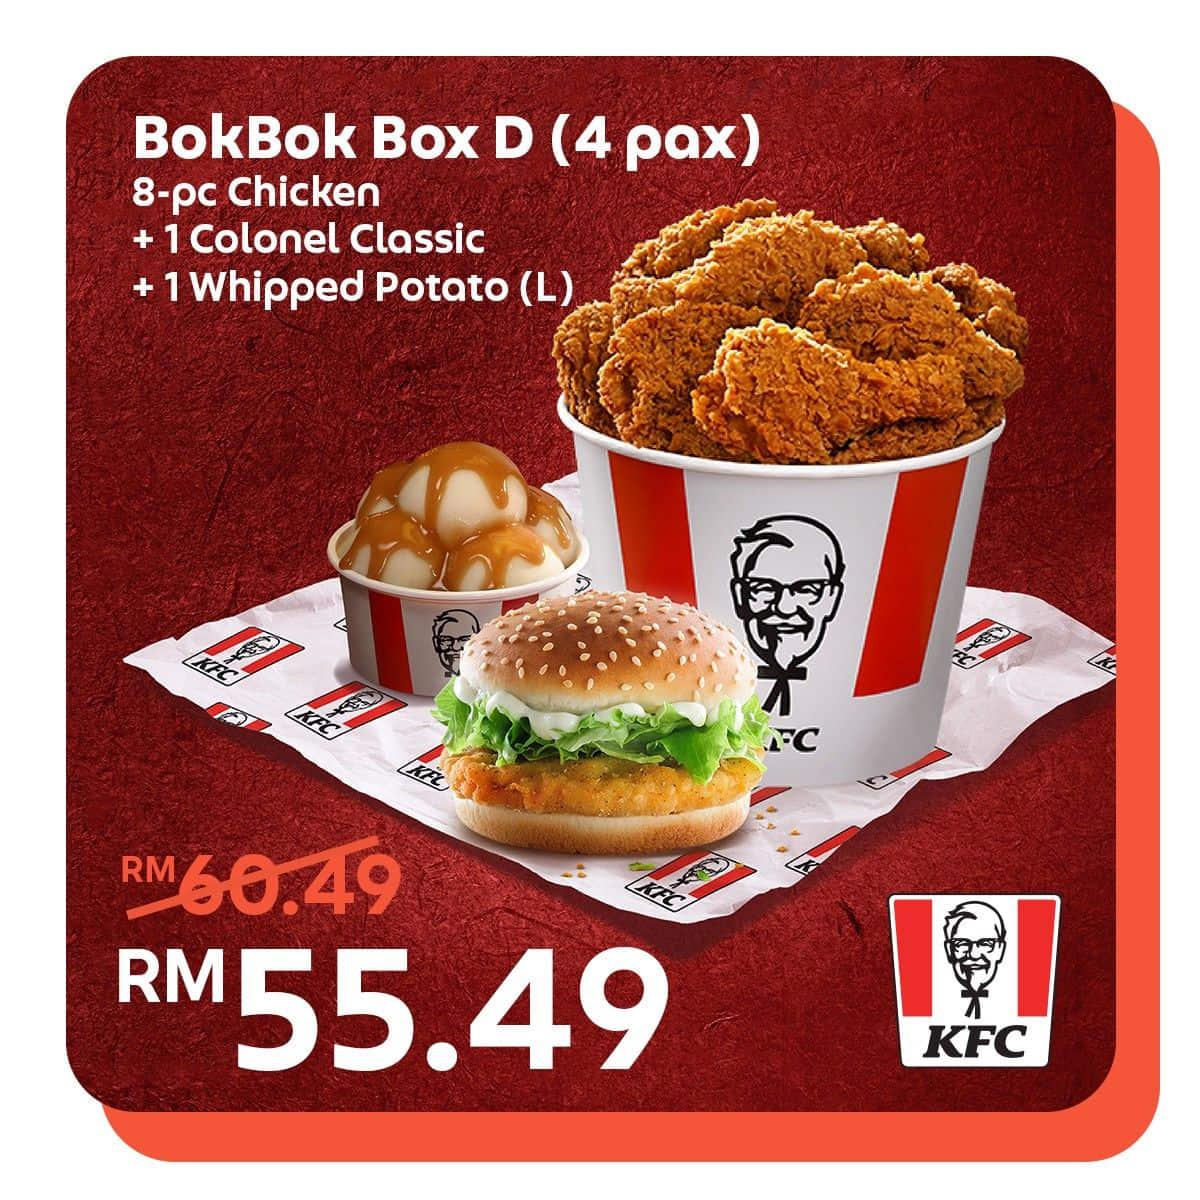 collectionncard_OC_KFC